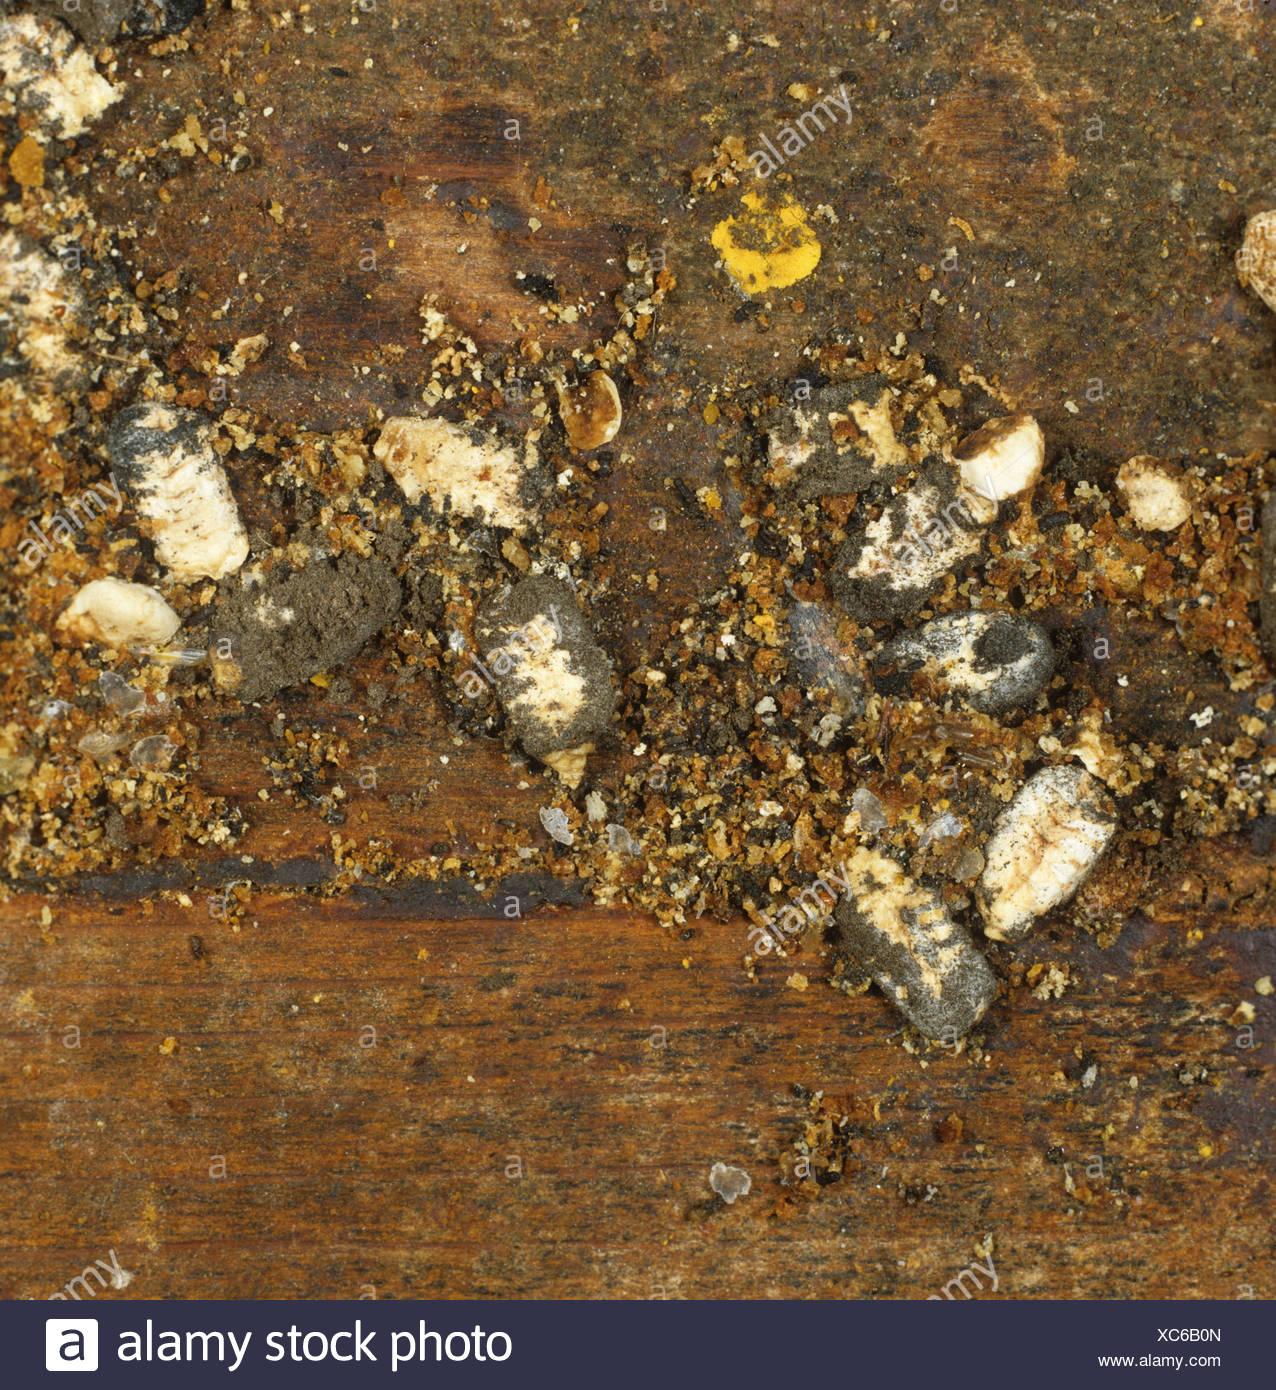 Chalk brood mummies and wax moth larvae among honey bee hive debris - Stock Image